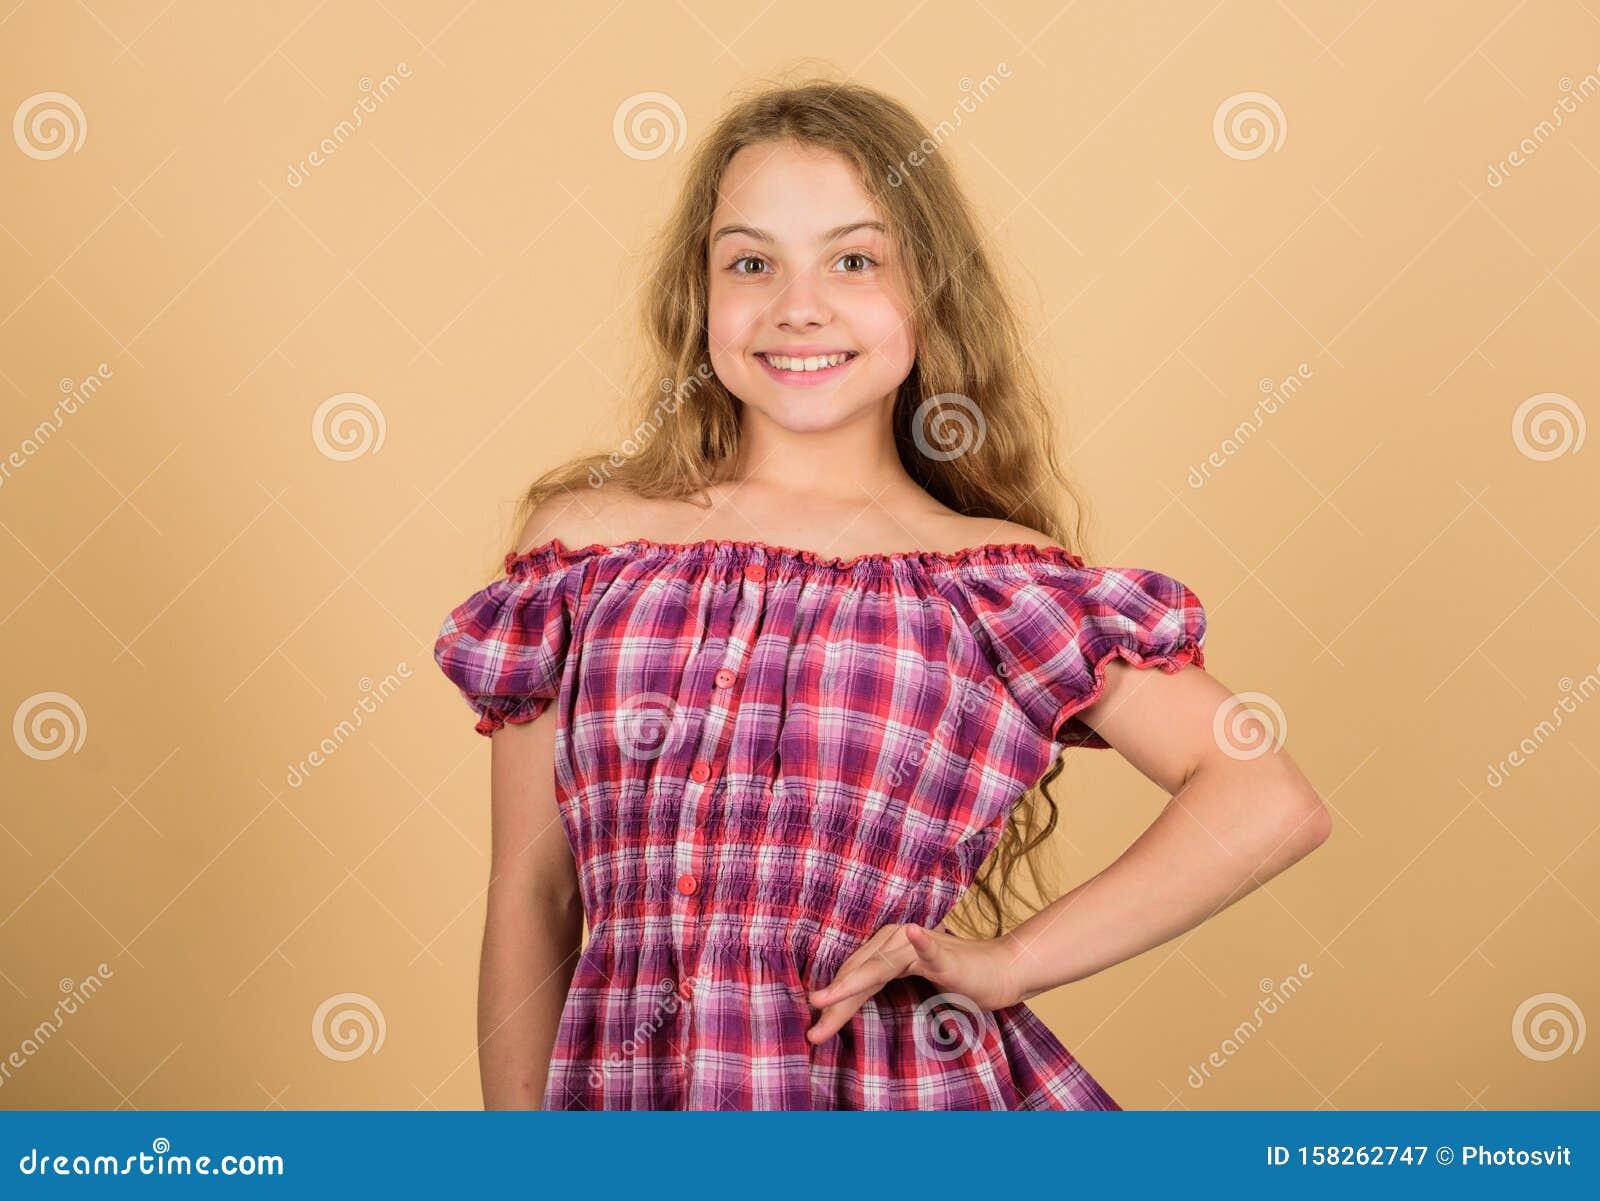 Stylish beauty. kid fashion. long blond curly hair. beautiful little girl fashion model. small kid in dress. happy small